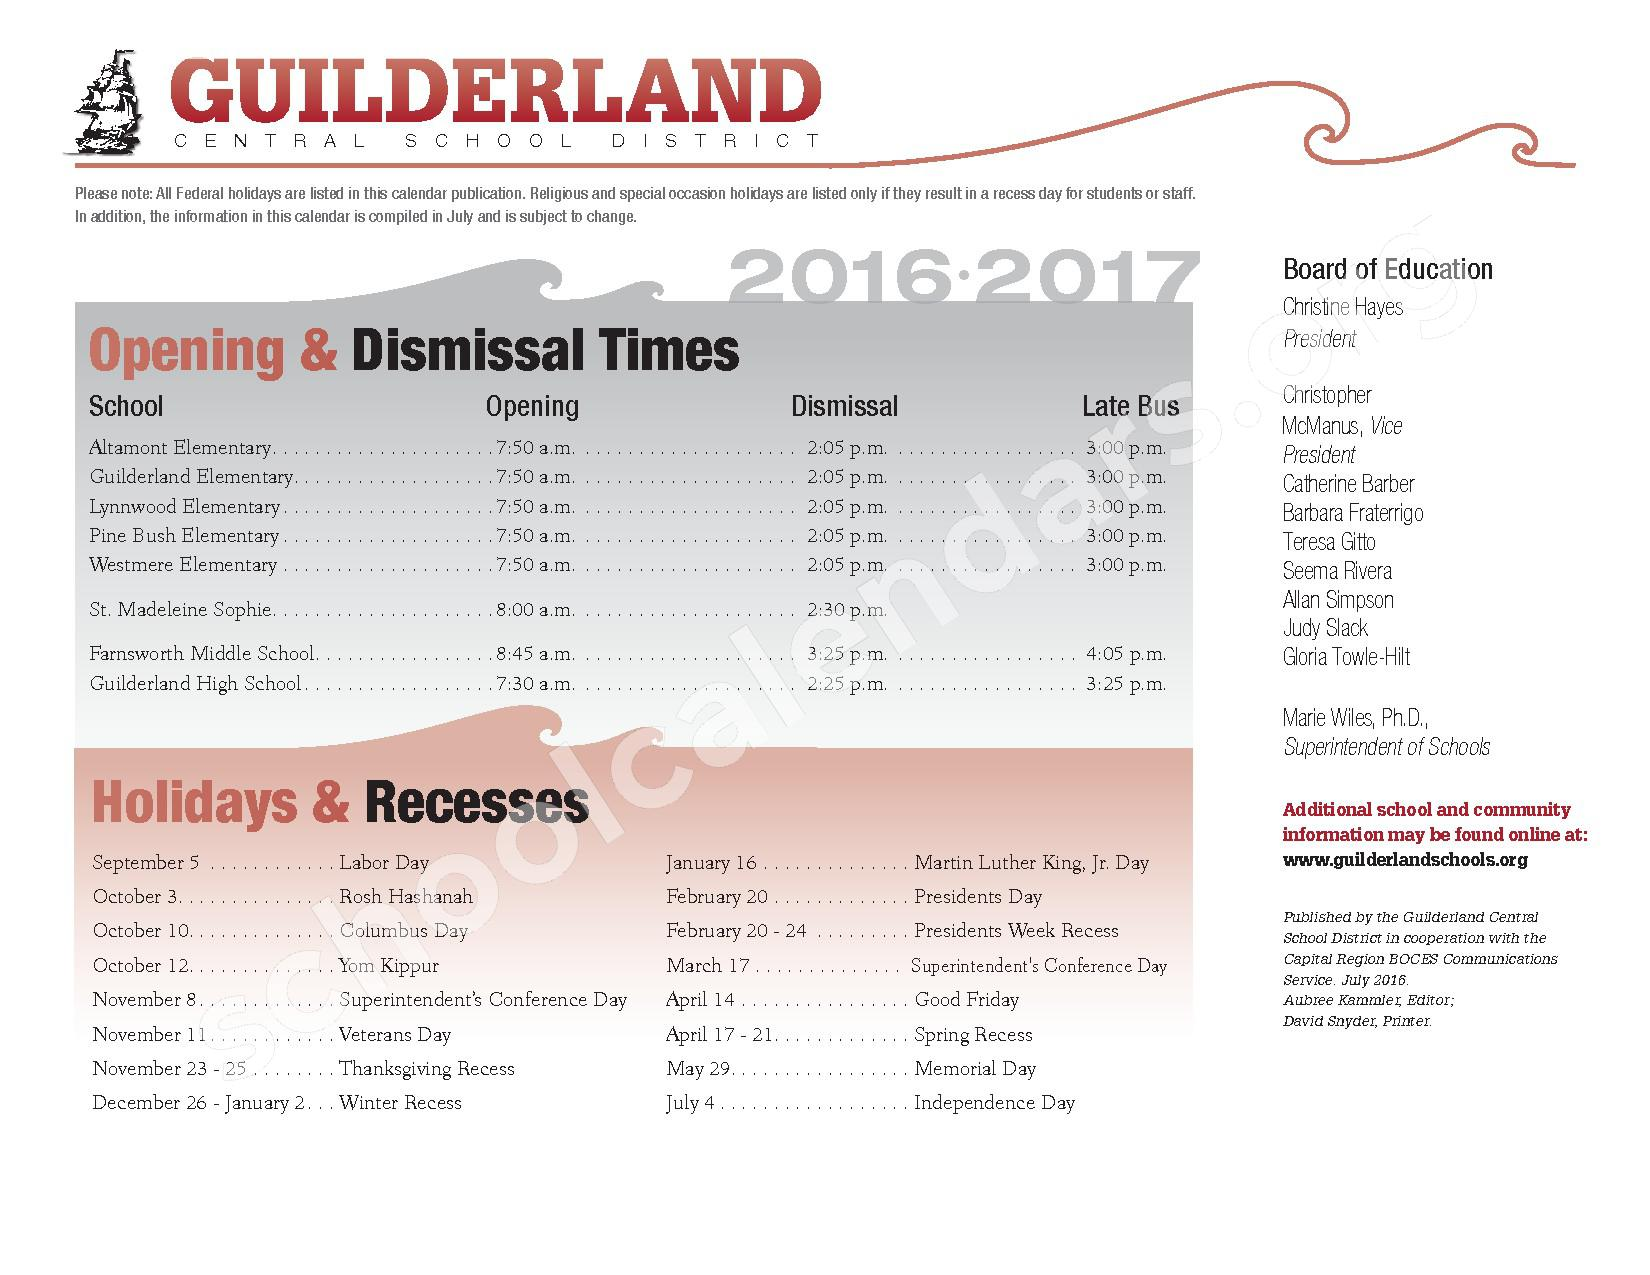 2016 - 2017 School Calendar | Guilderland Central School